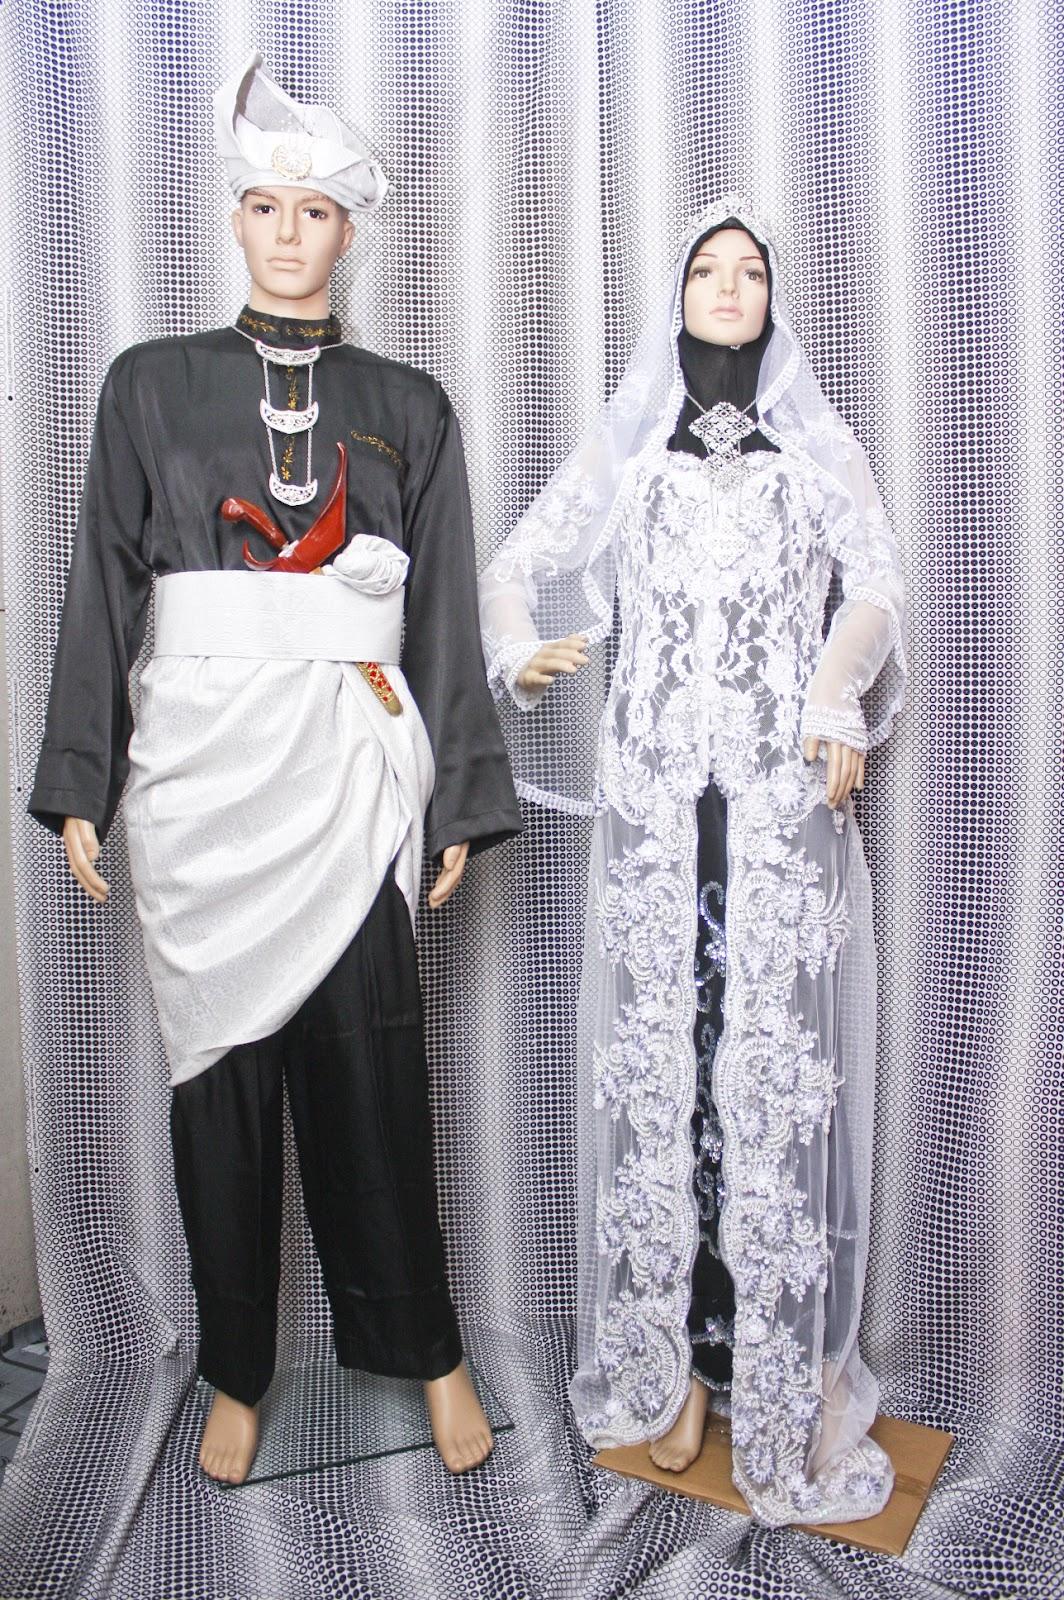 Sewa Pakaian Atau Busana Atau Baju Pengantin Songket Dan